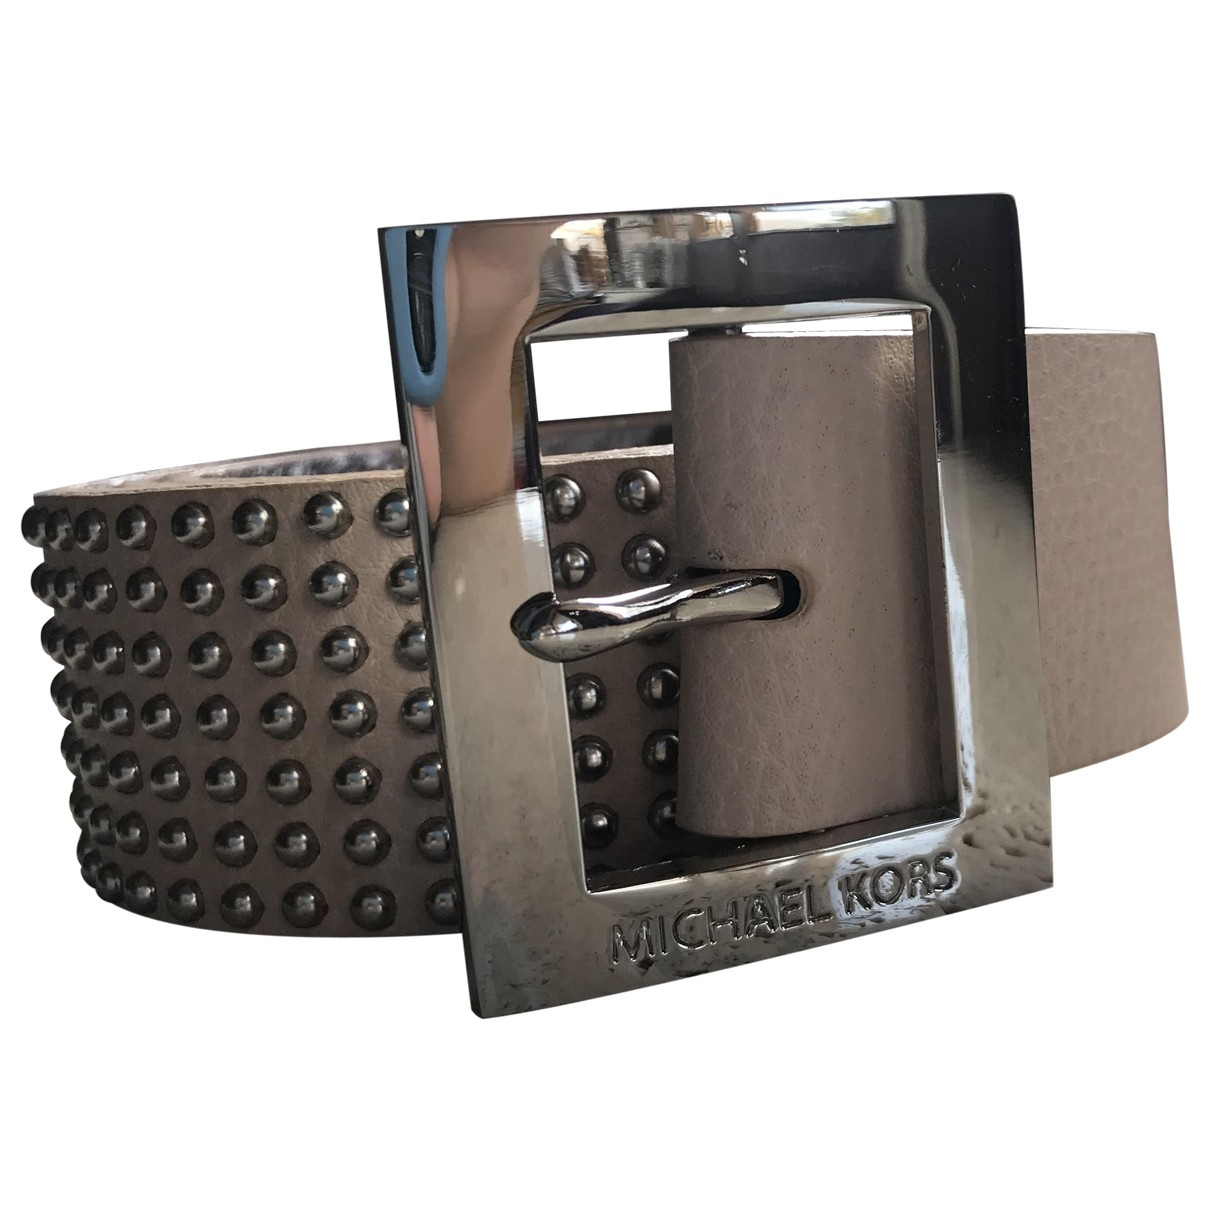 Michael Kors \N Beige Leather belt for Women L International